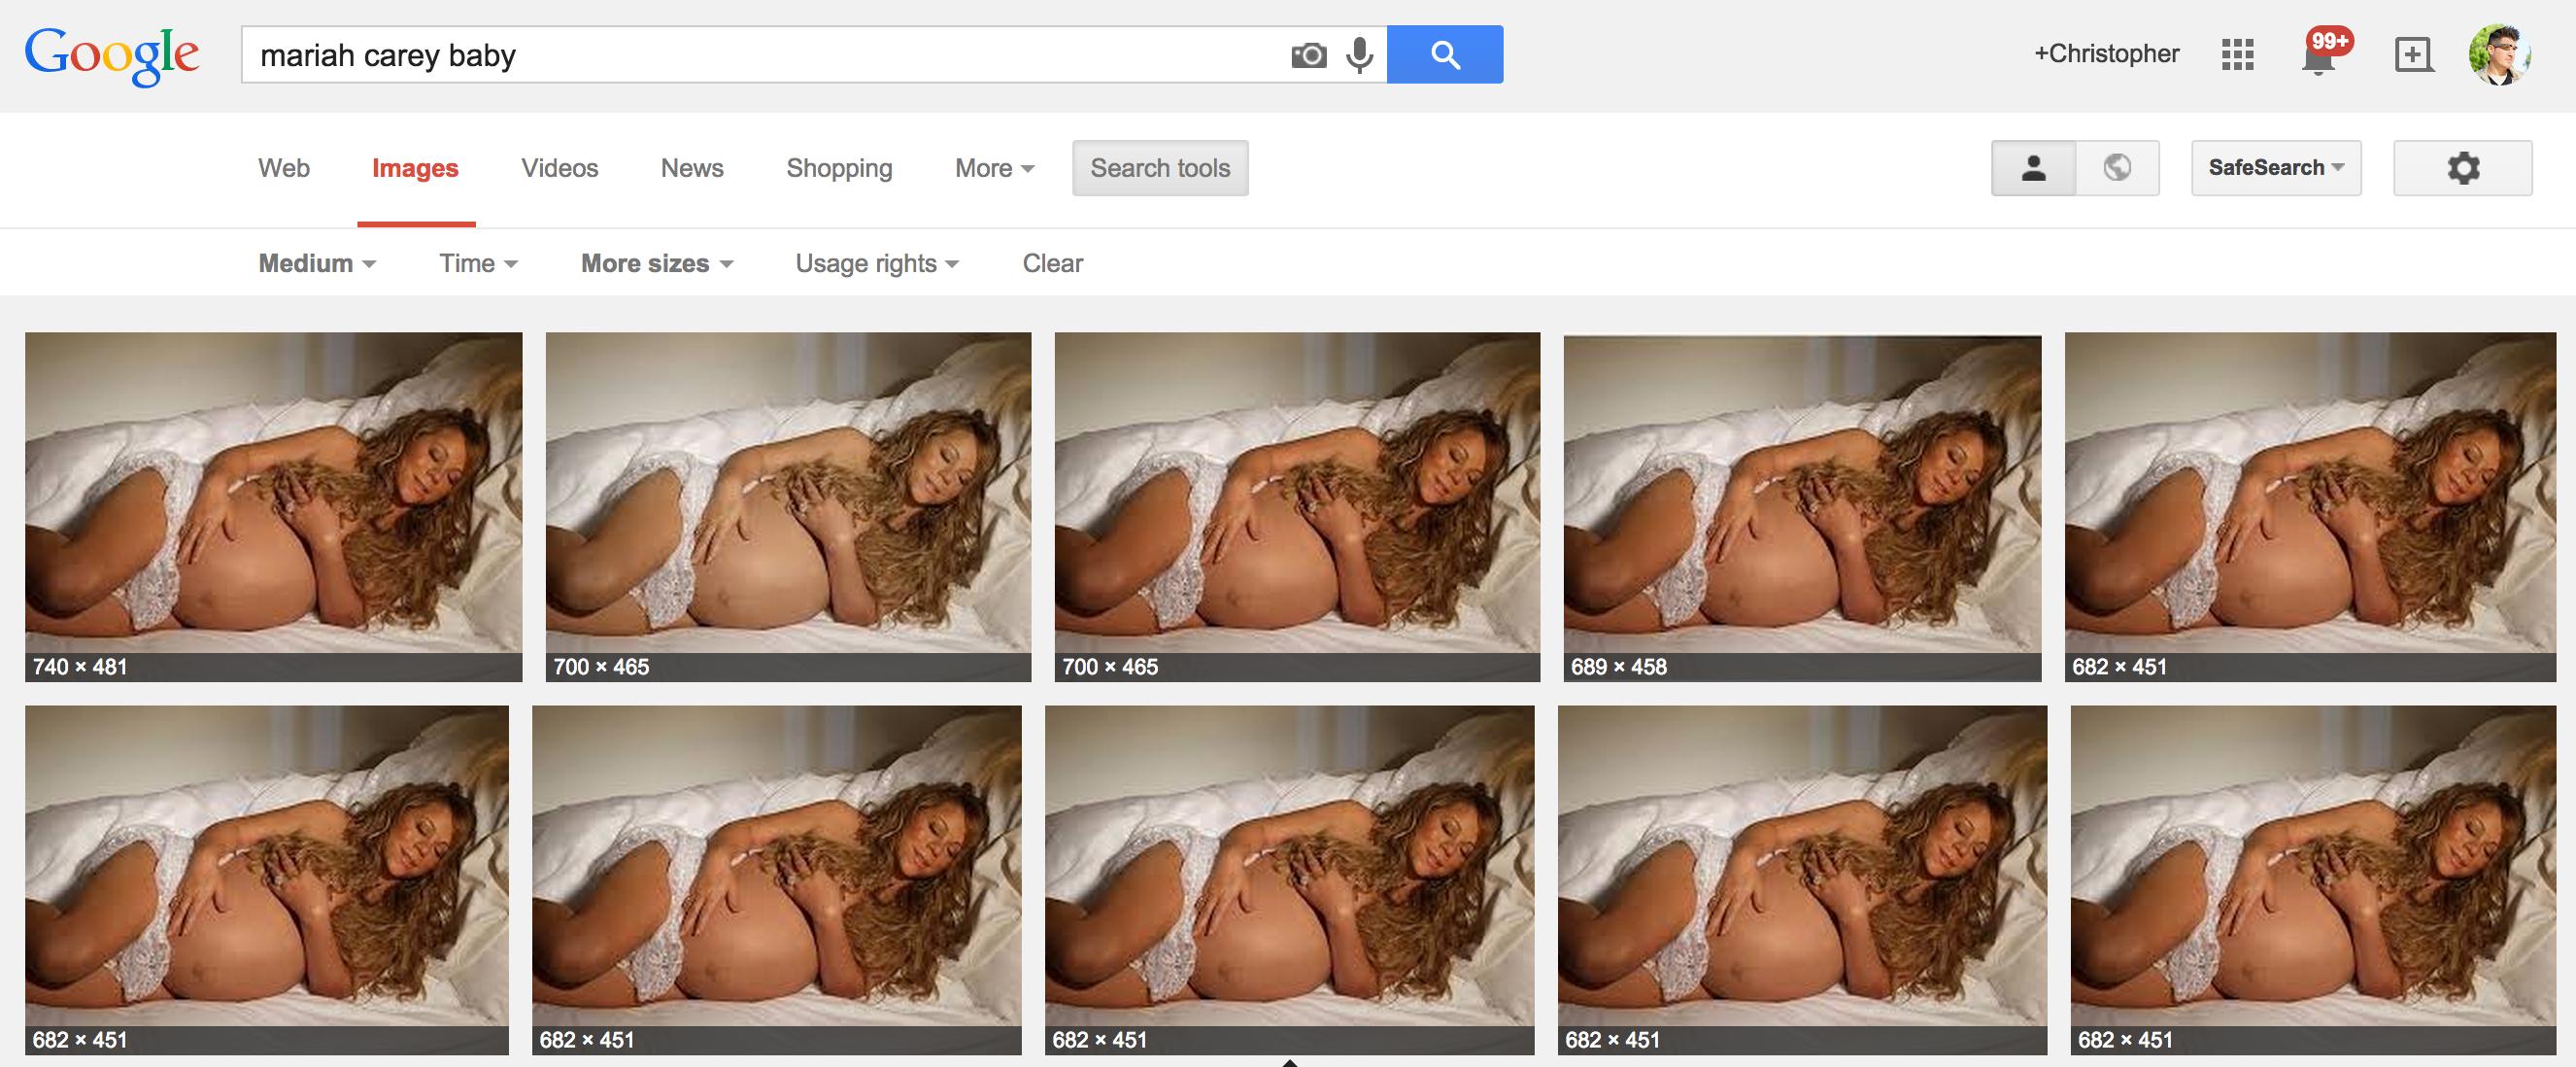 Mariah Carey Pregnant Chipotle